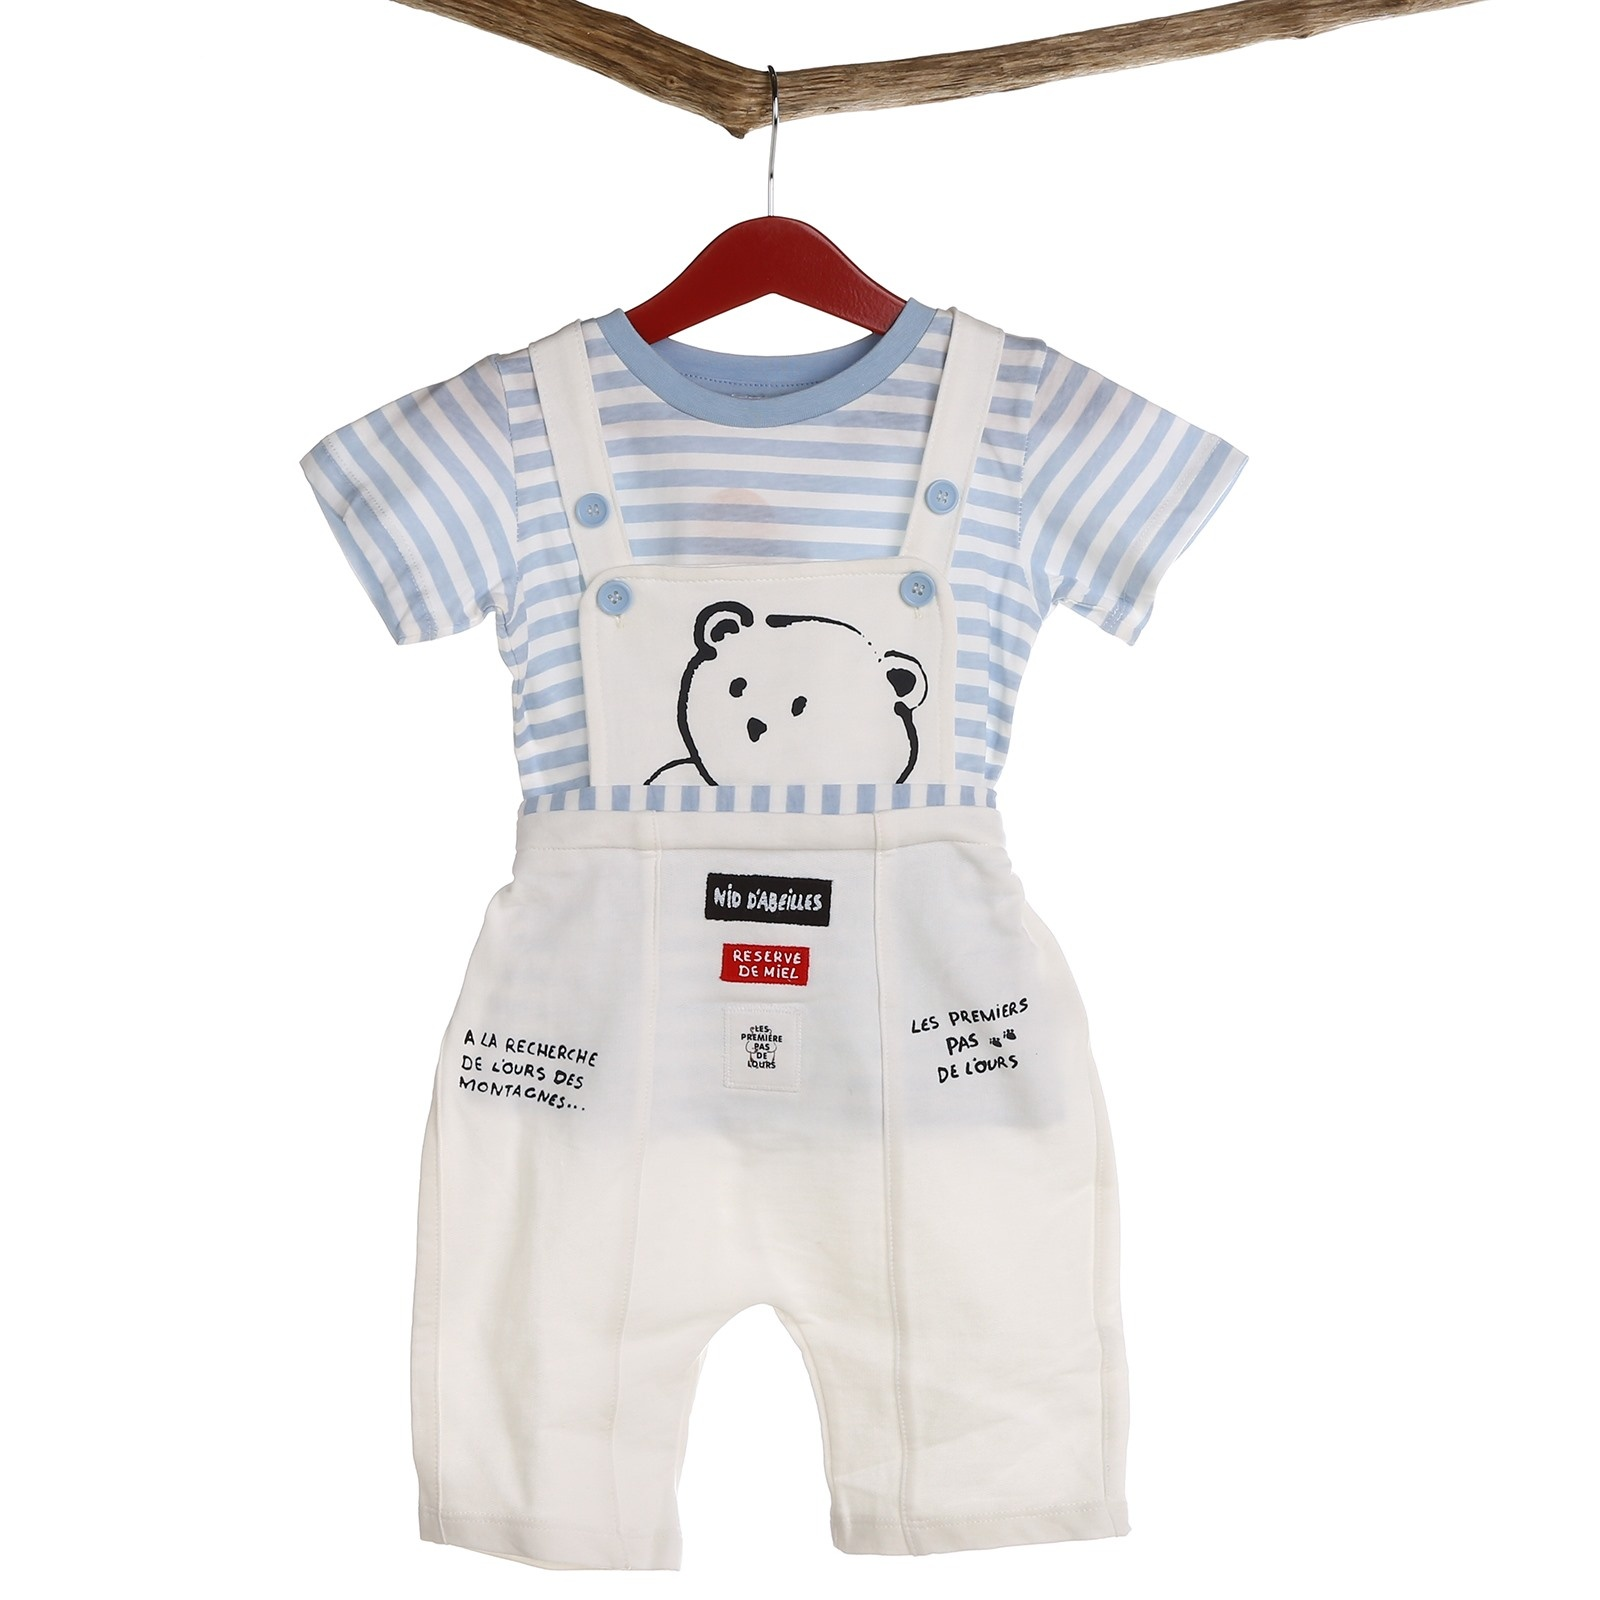 Ebebek HelloBaby Baby Boy Tiny Bear Dungarees Tshirt Set